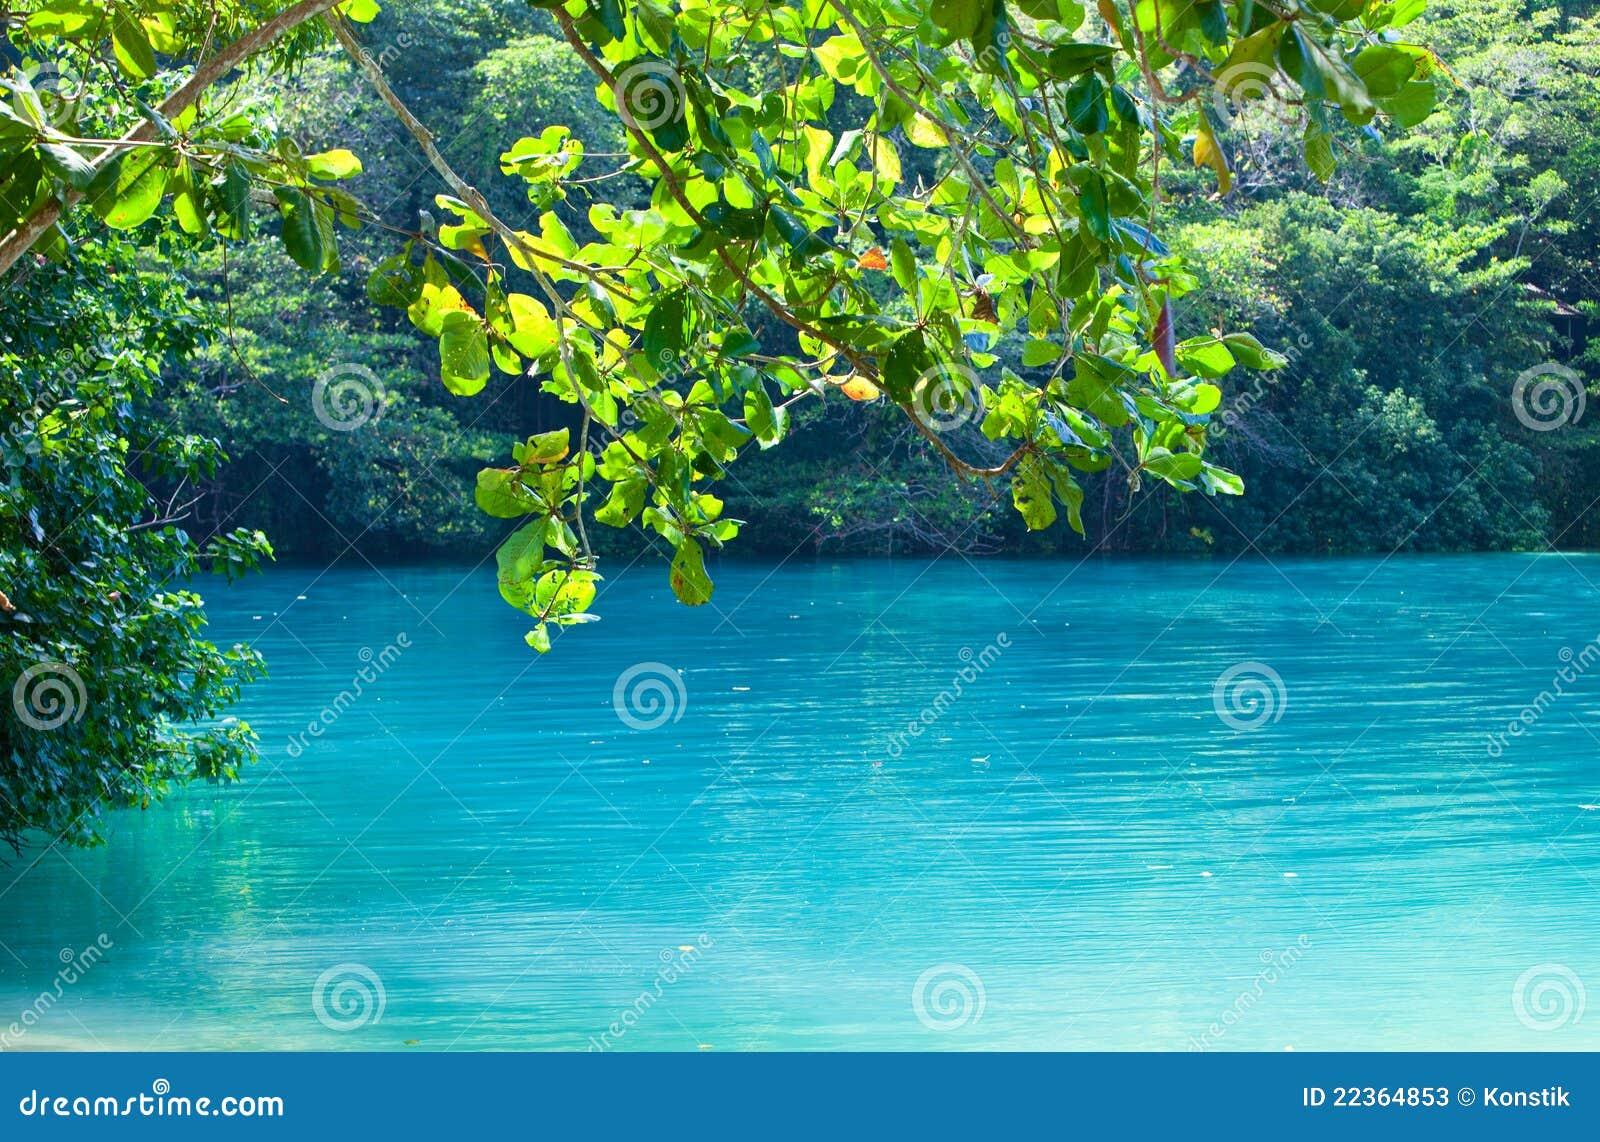 Jamaica A Blue Lagoon Stock Image Image Of Romantic